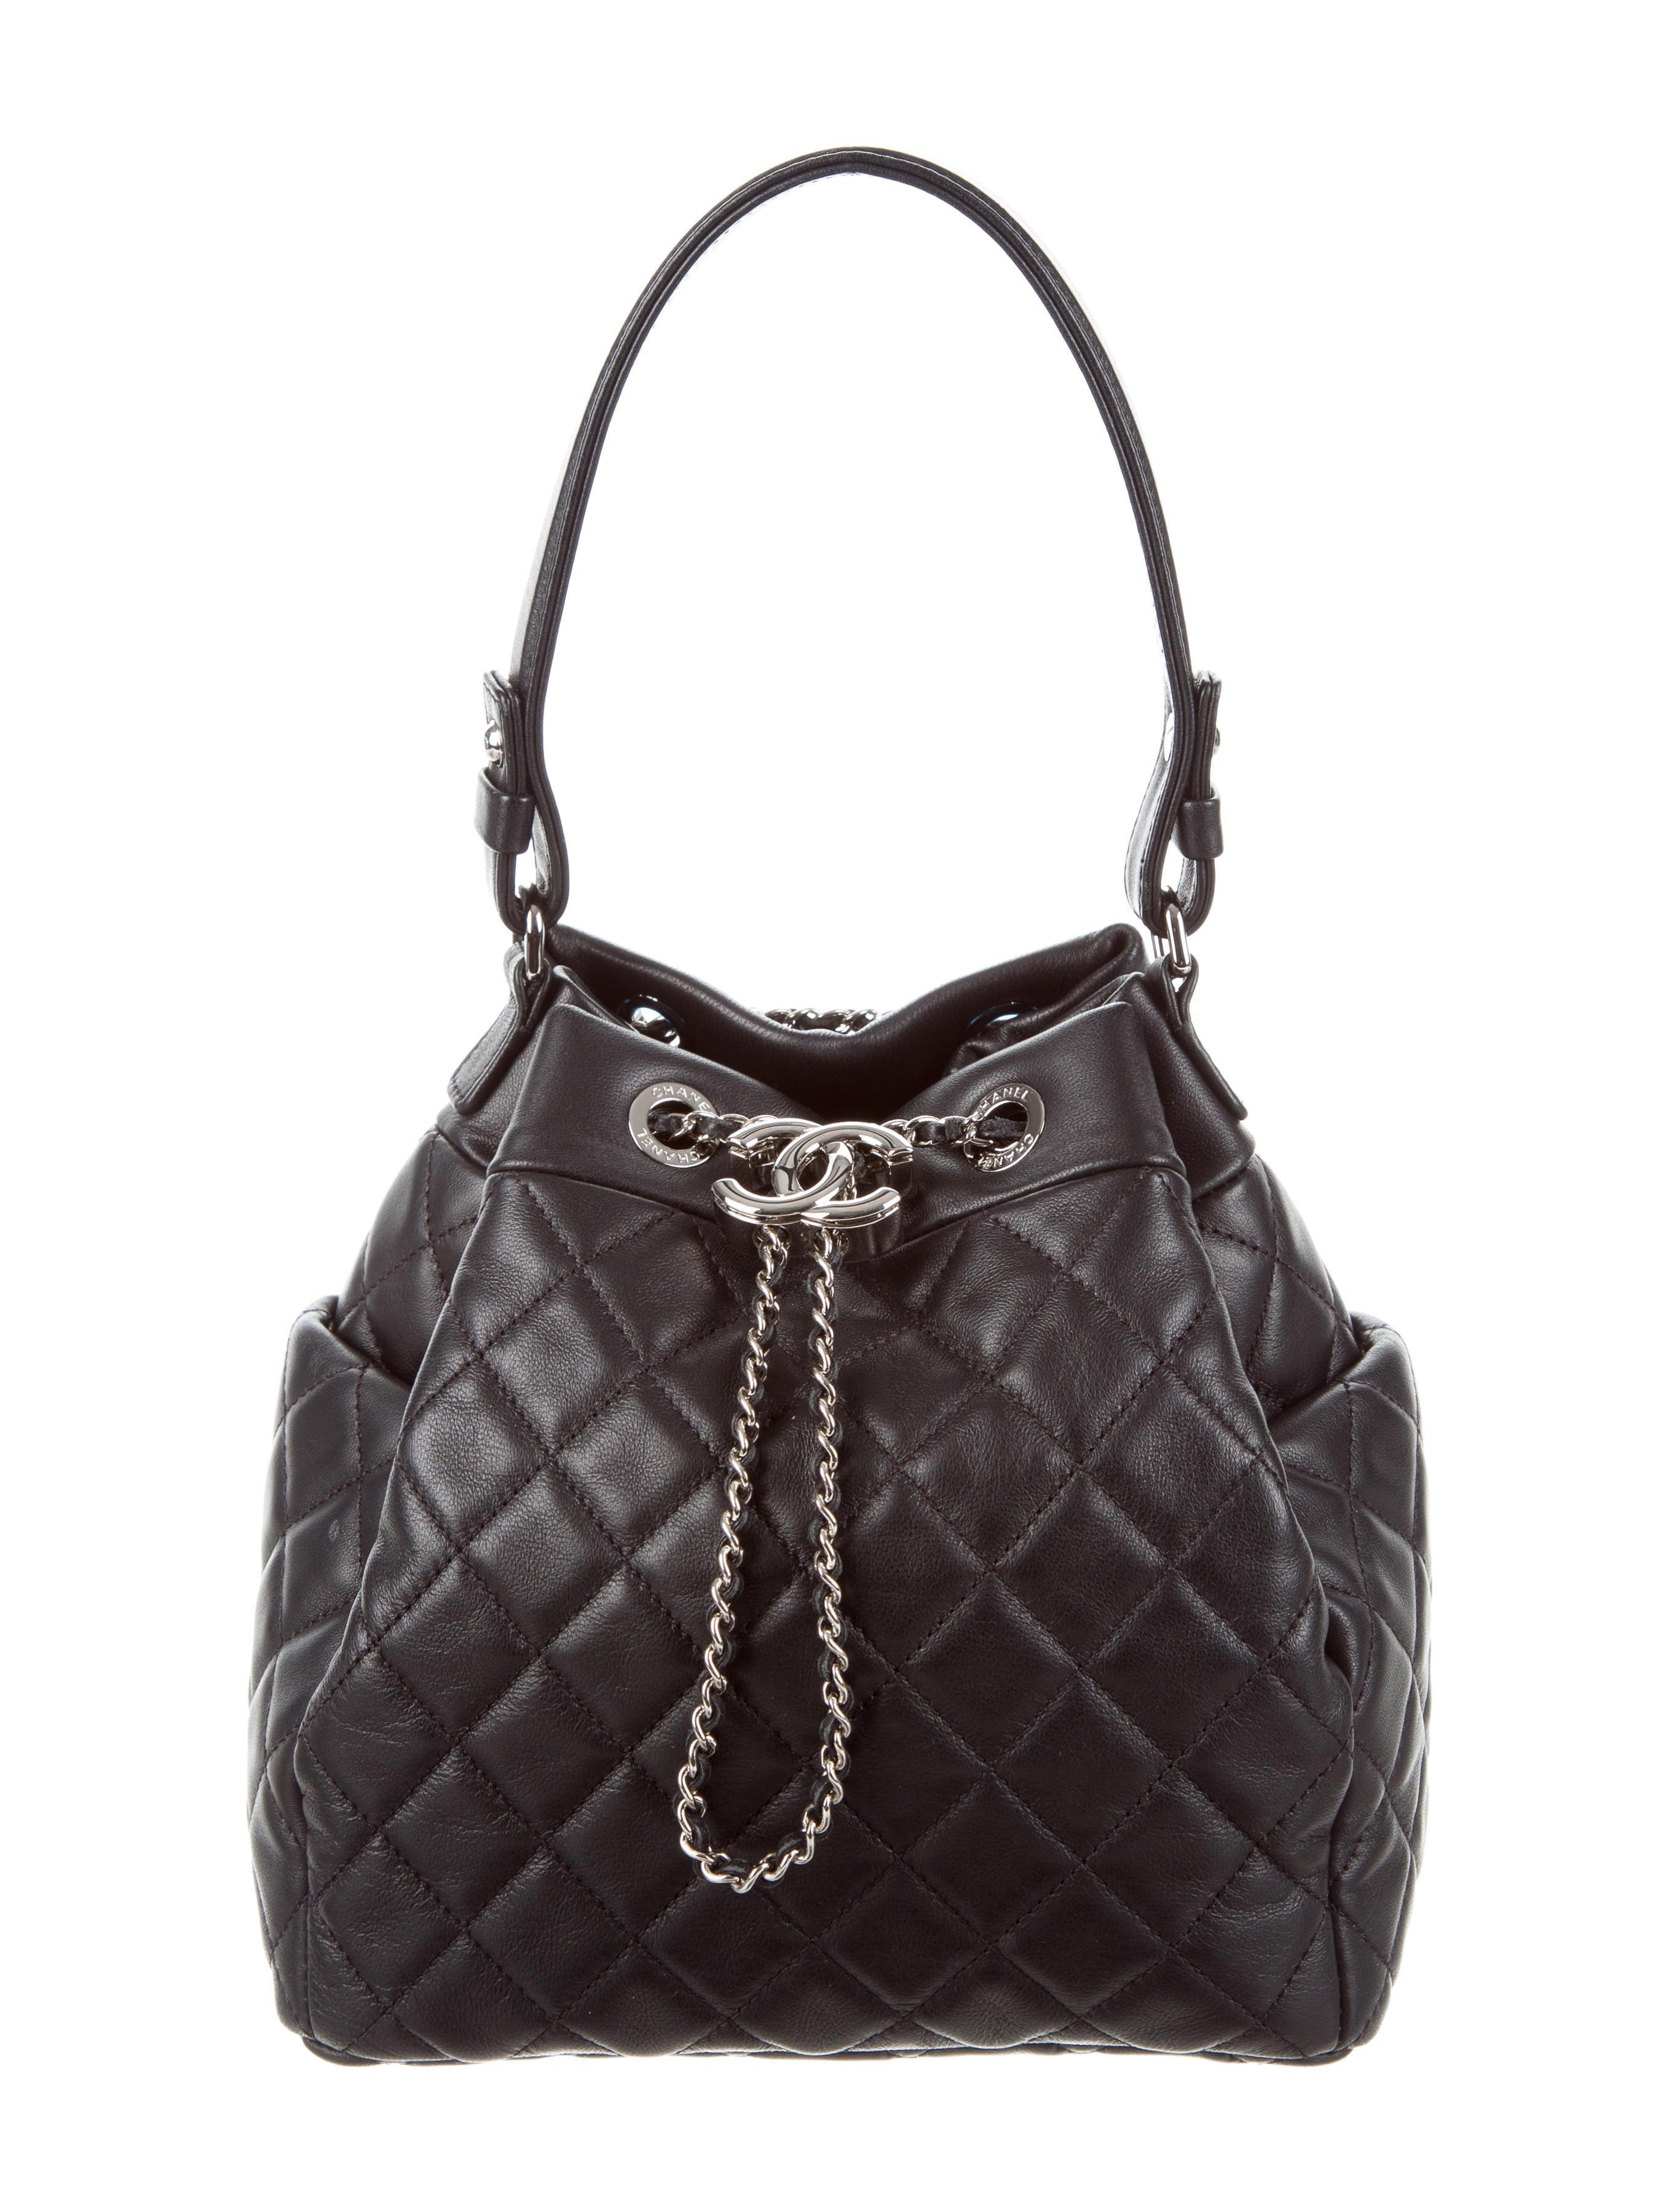 1606640384ba Chanel 2016 Drawstring Bucket Bag | Stanford Center for Opportunity ...